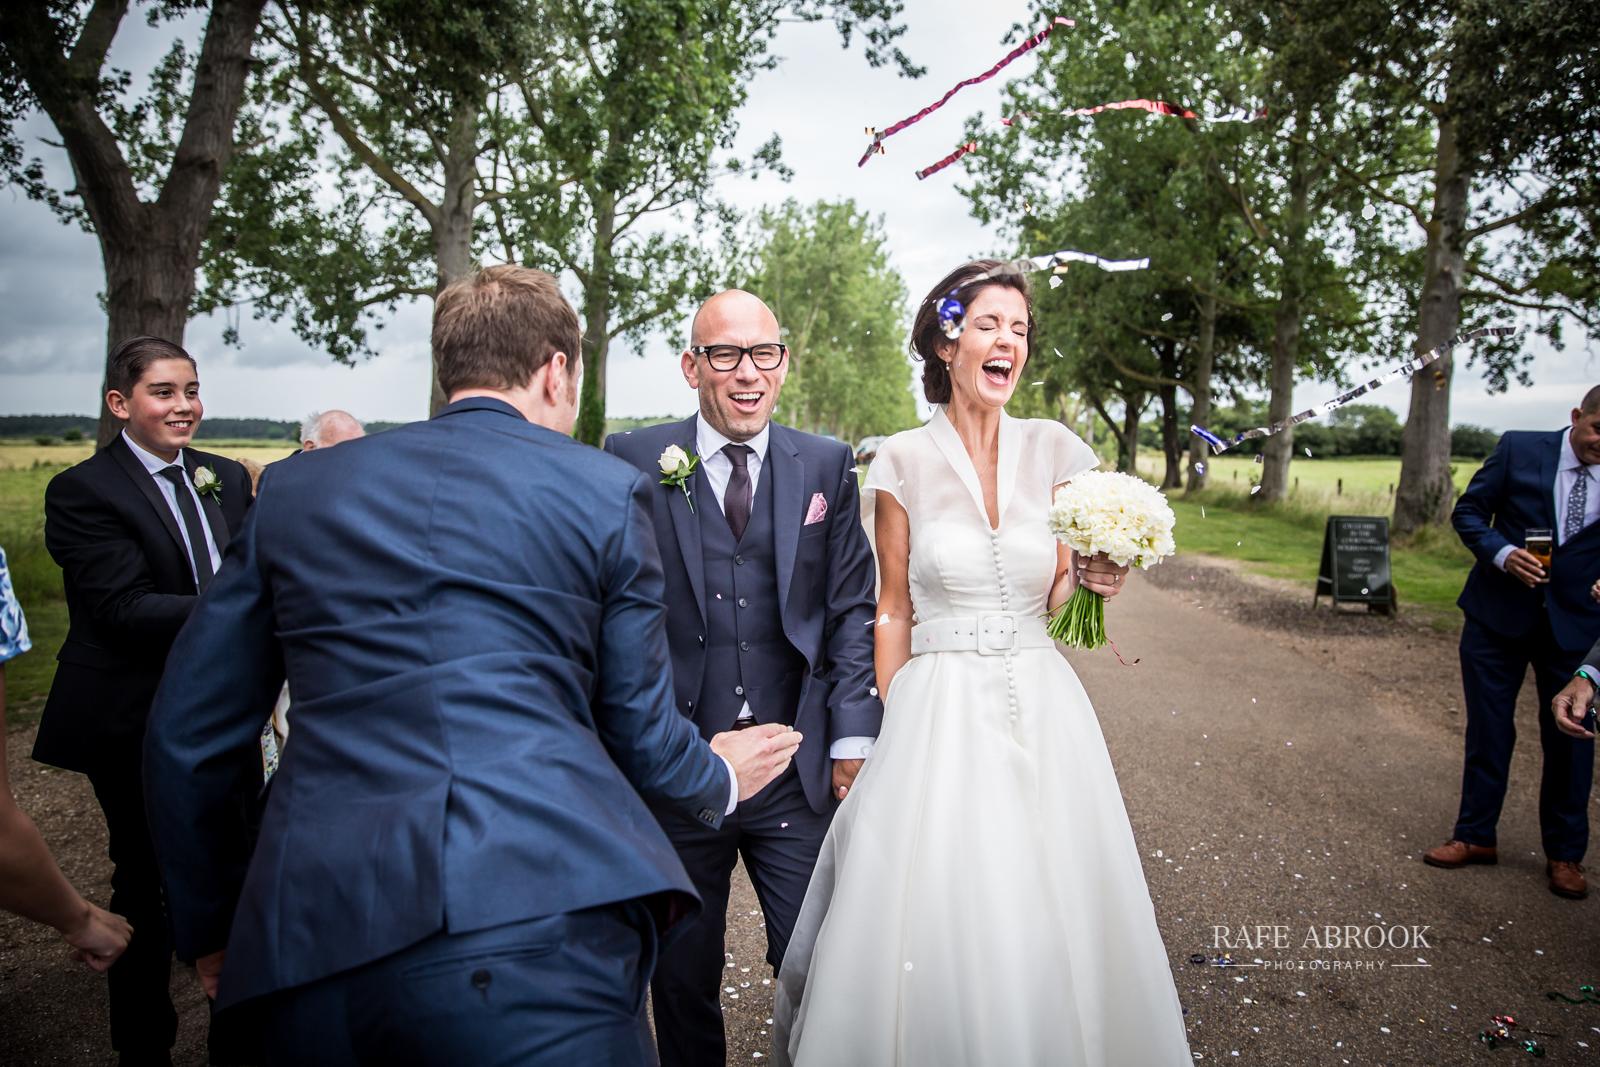 cley windmill wedding norfolk hertfordshire wedding photographer-1257.jpg